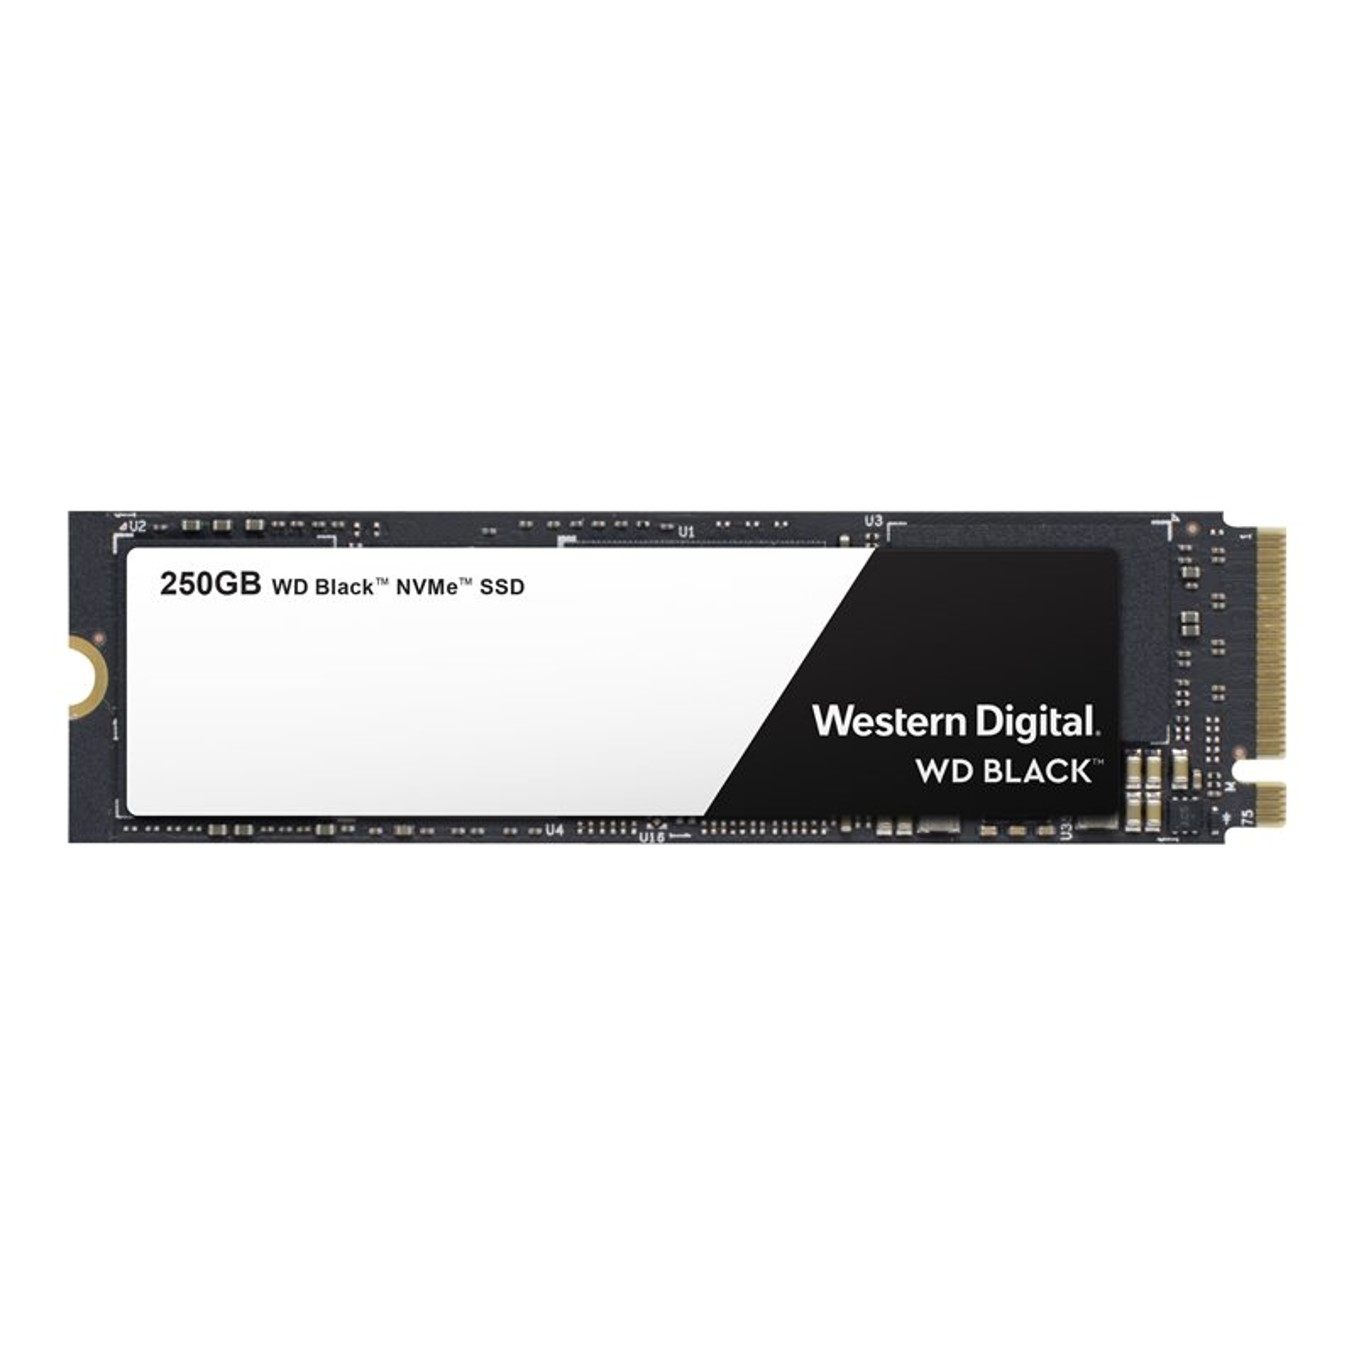 DISCO DURO INTERNO SOLIDO HDD SSD M.2 WD WESTERN